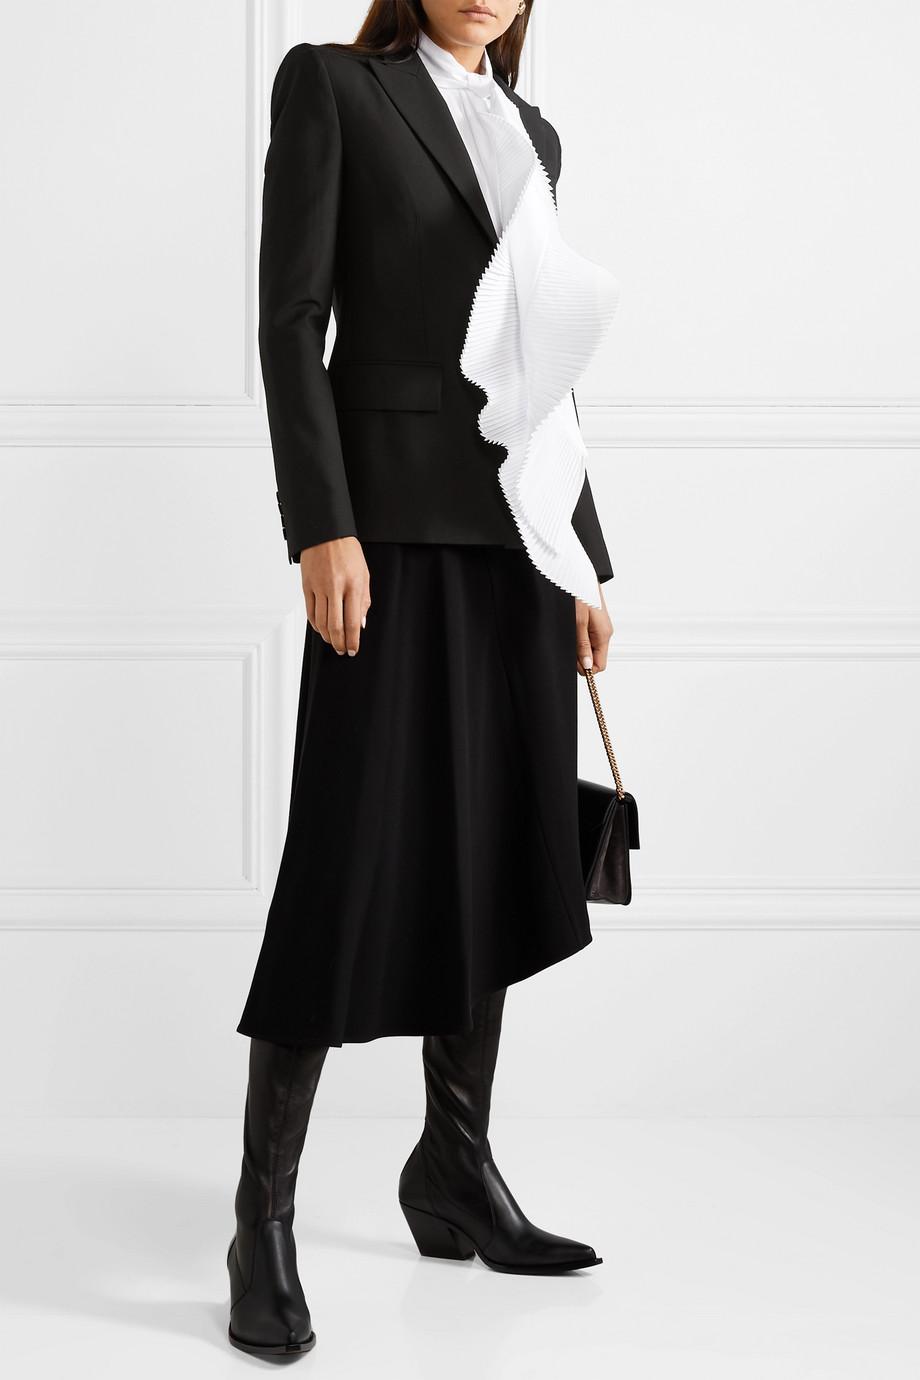 Givenchy Wool-crepe blazer